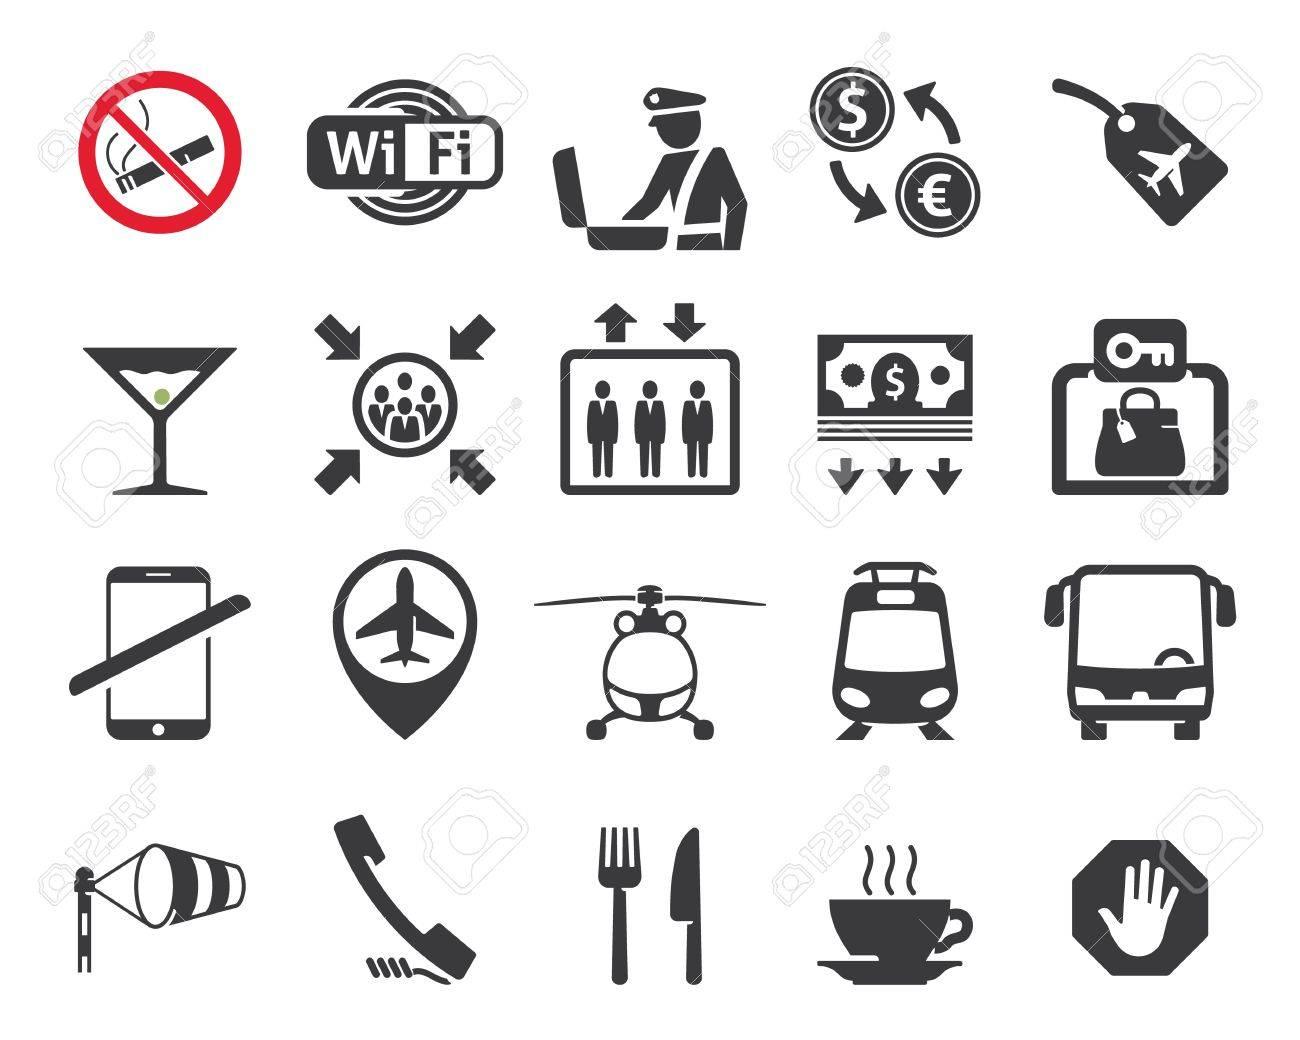 Travel and airport signs symbols royalty free cliparts vectors travel and airport signs symbols stock vector 20654099 buycottarizona Choice Image